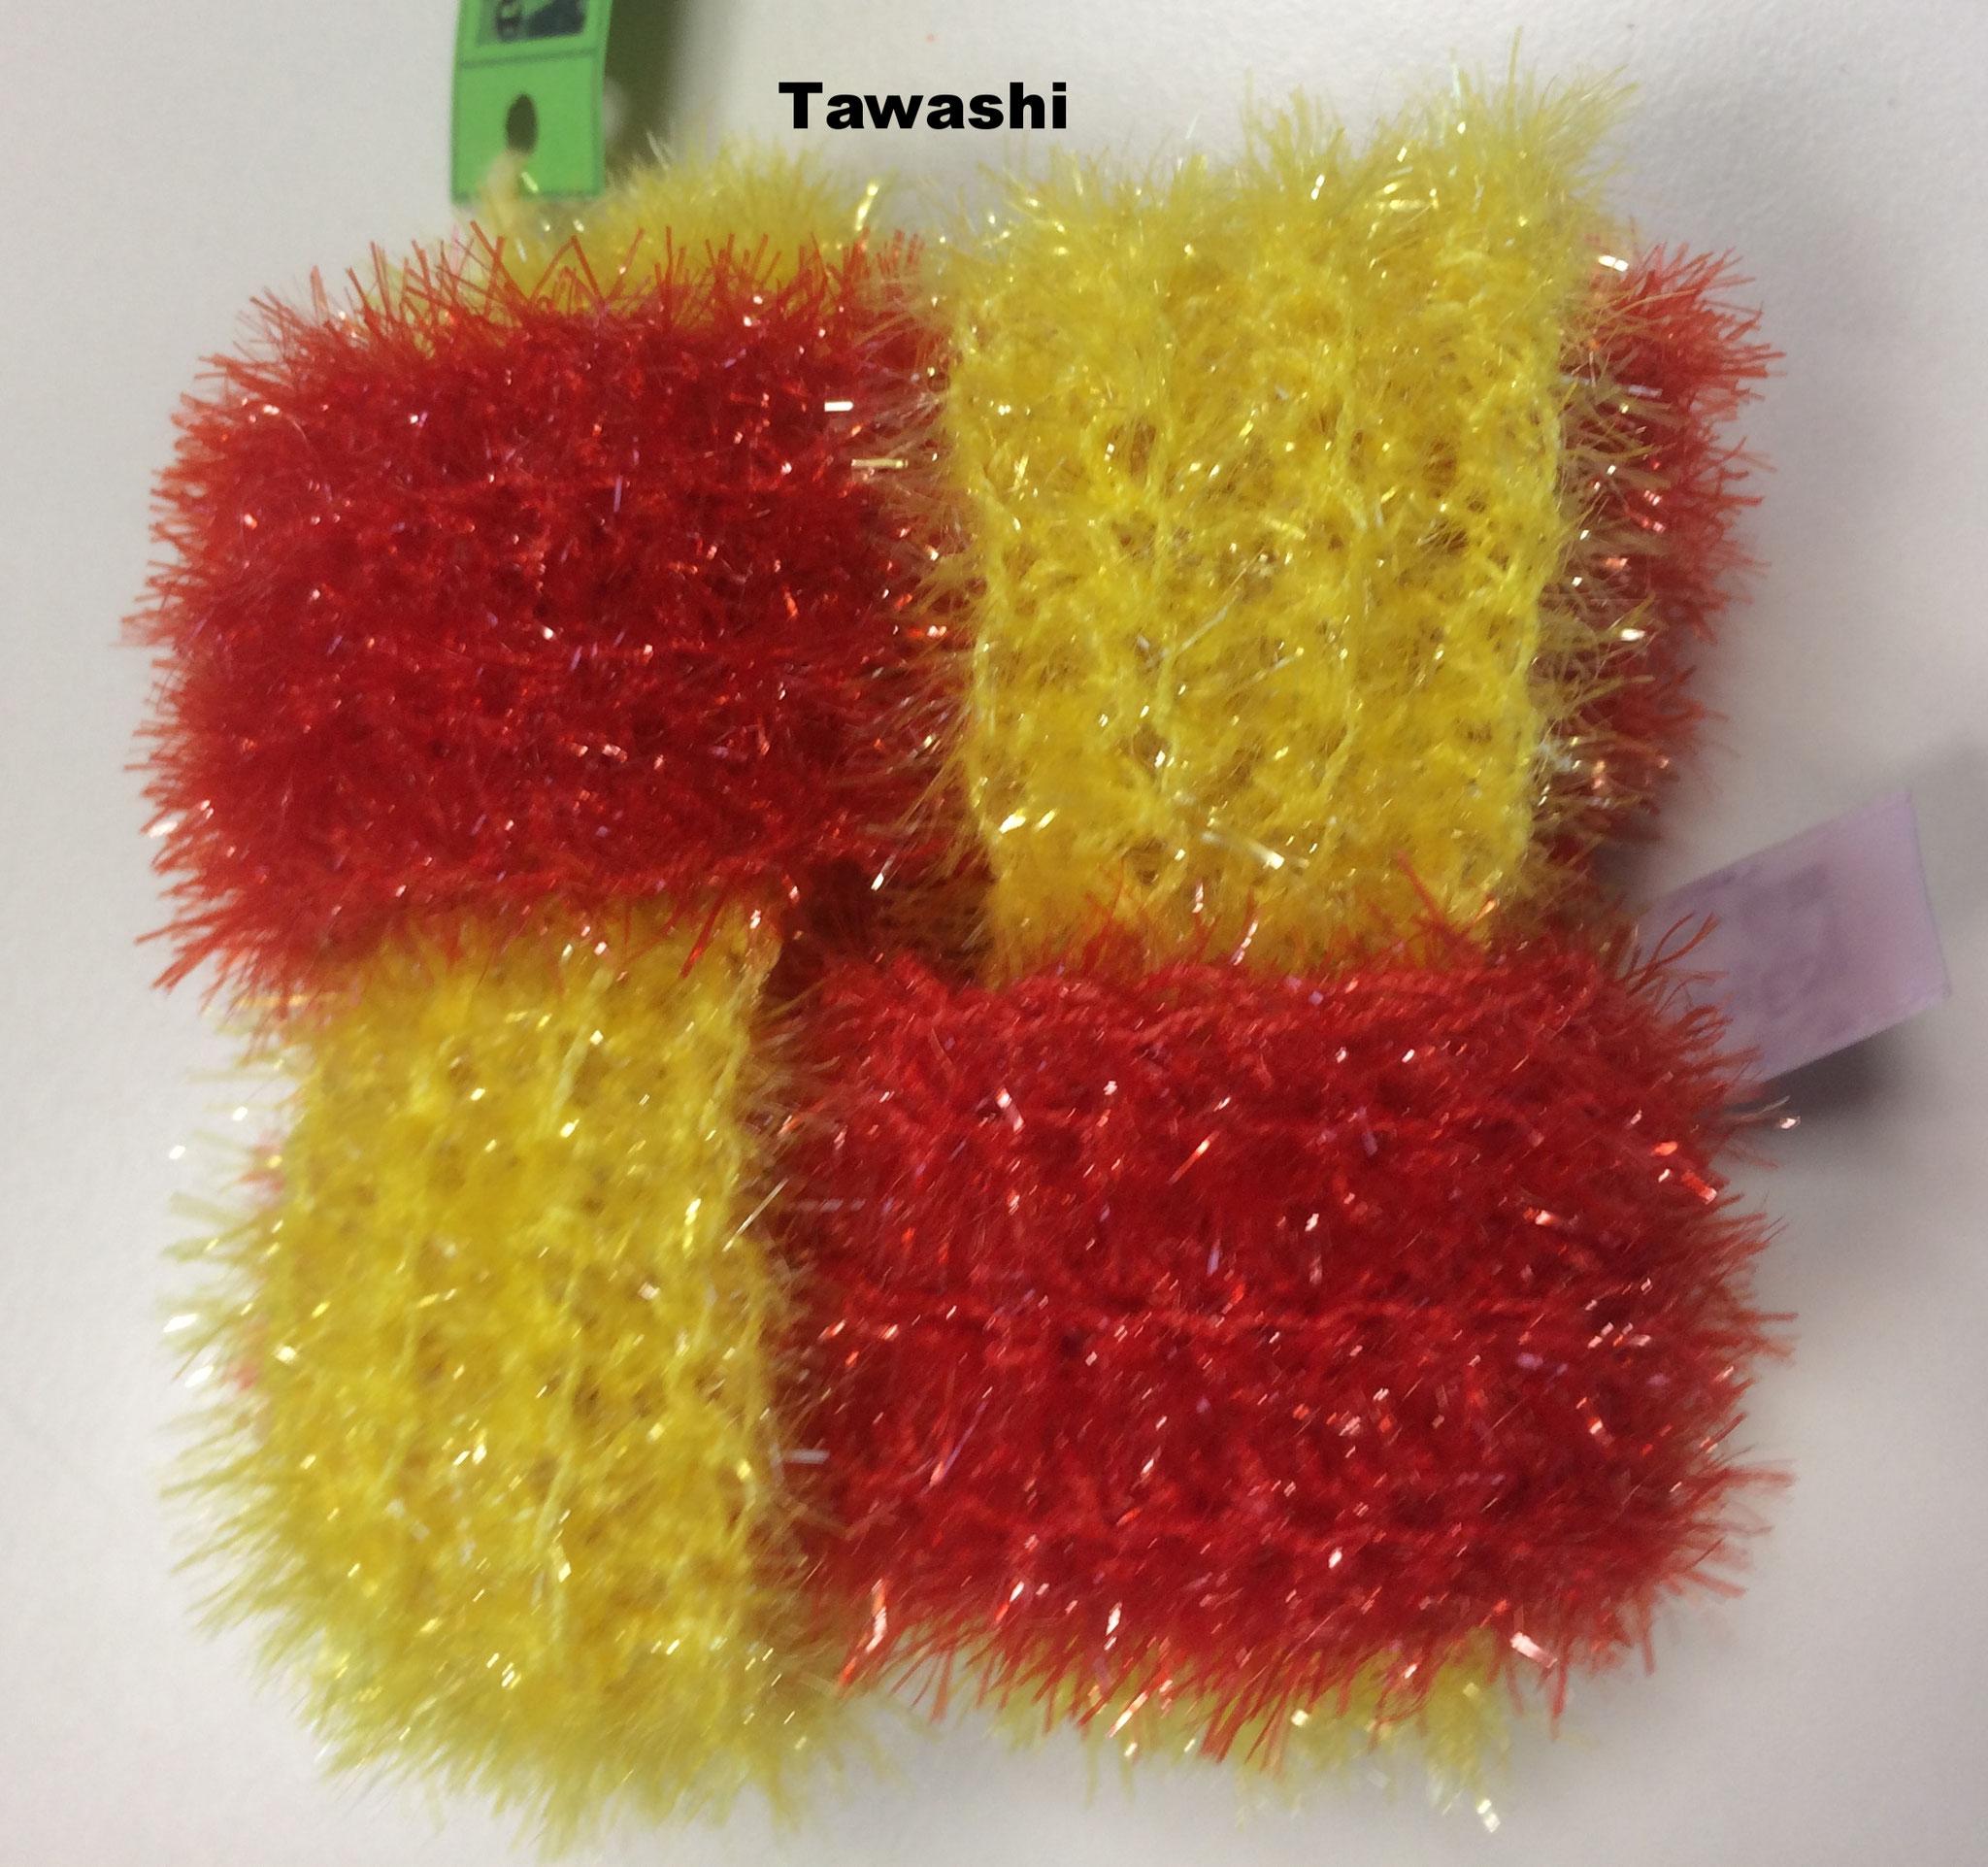 Schwamm: Tawashi / Artikel-Nr. 3048.000